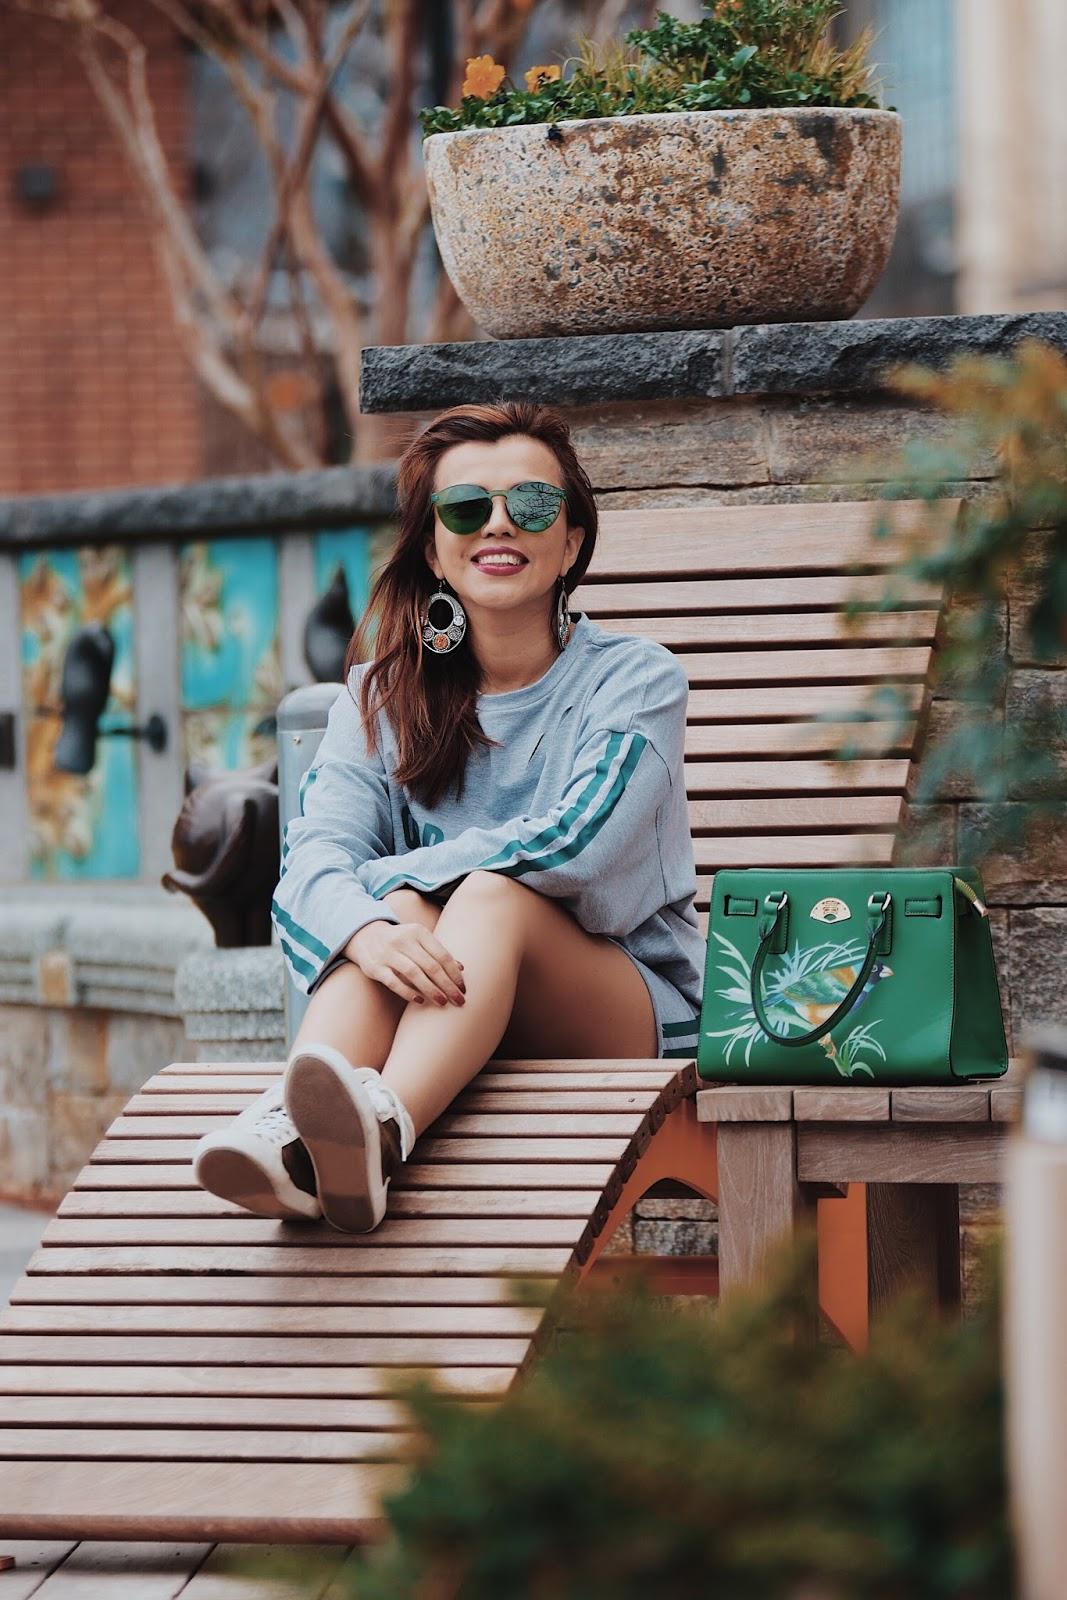 Lovely Gray by Mari Estilo-mariestilo-travelblogger-mariestilotravels-placestogo-wonderfulplaces-shein-sportychic-tracksuits-marisolflamenco-influencer-dcblogger-armandhugon